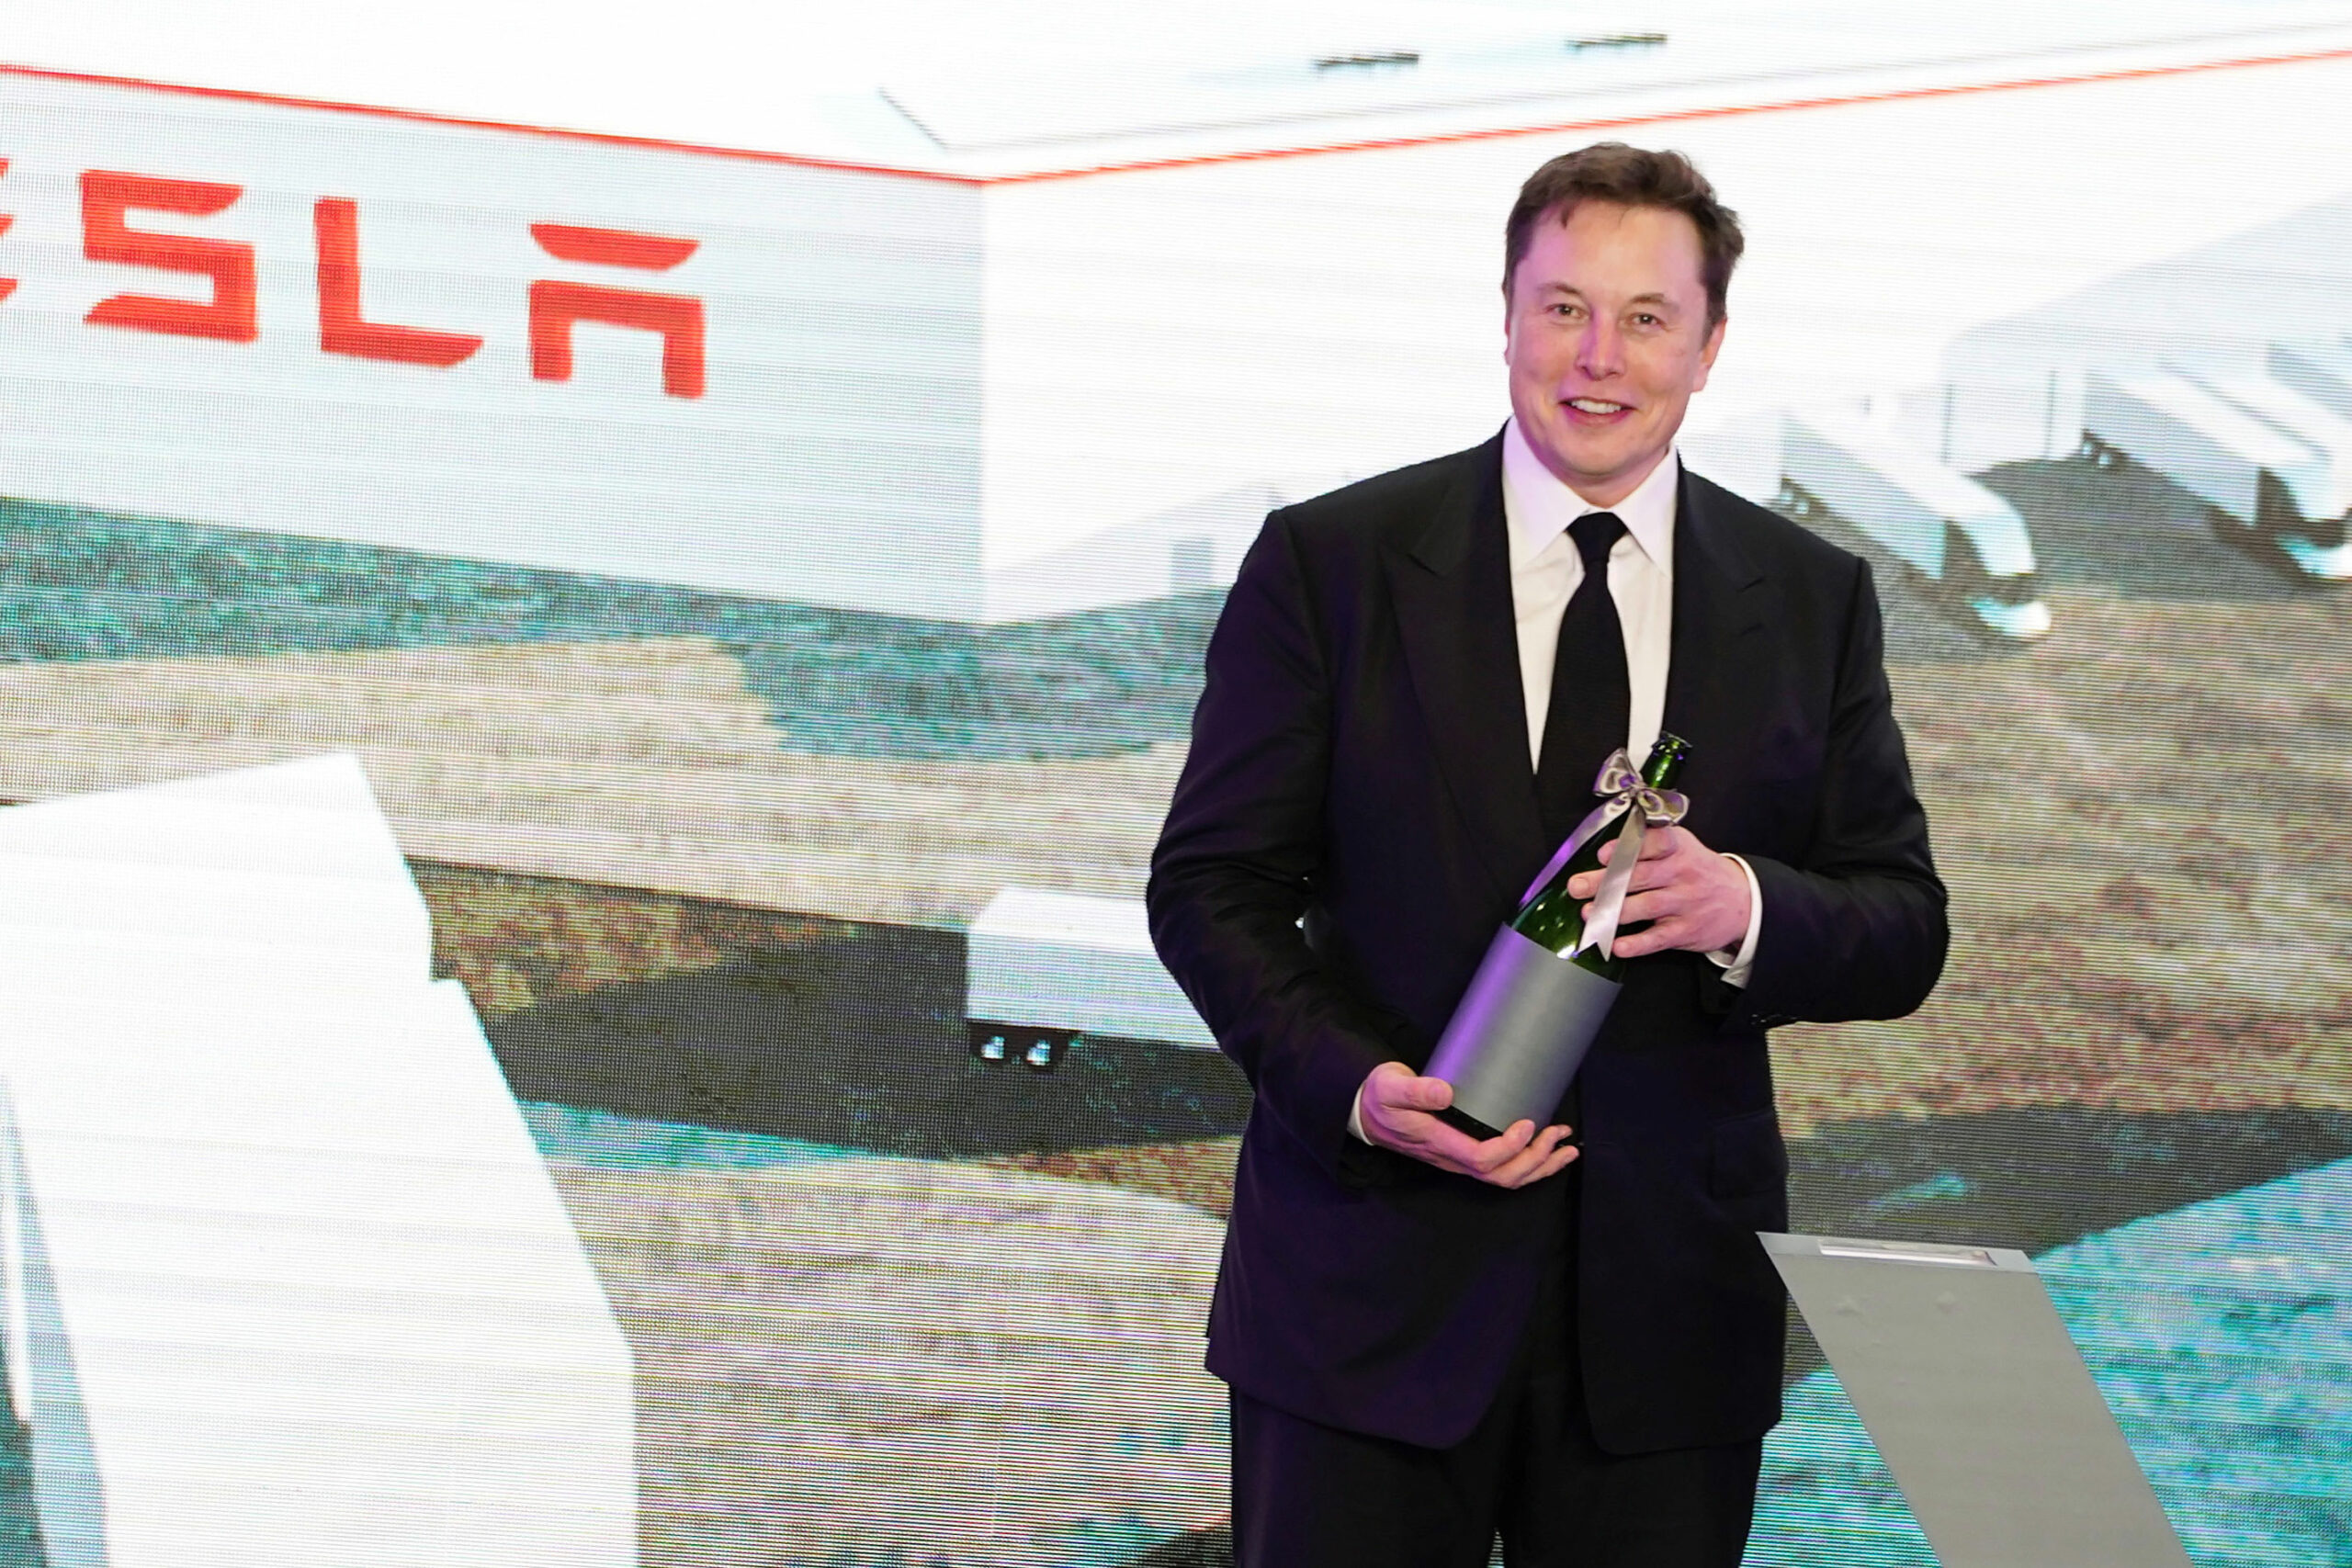 Tesla will build its next Gigafactory in close proximity to Austin, Texas